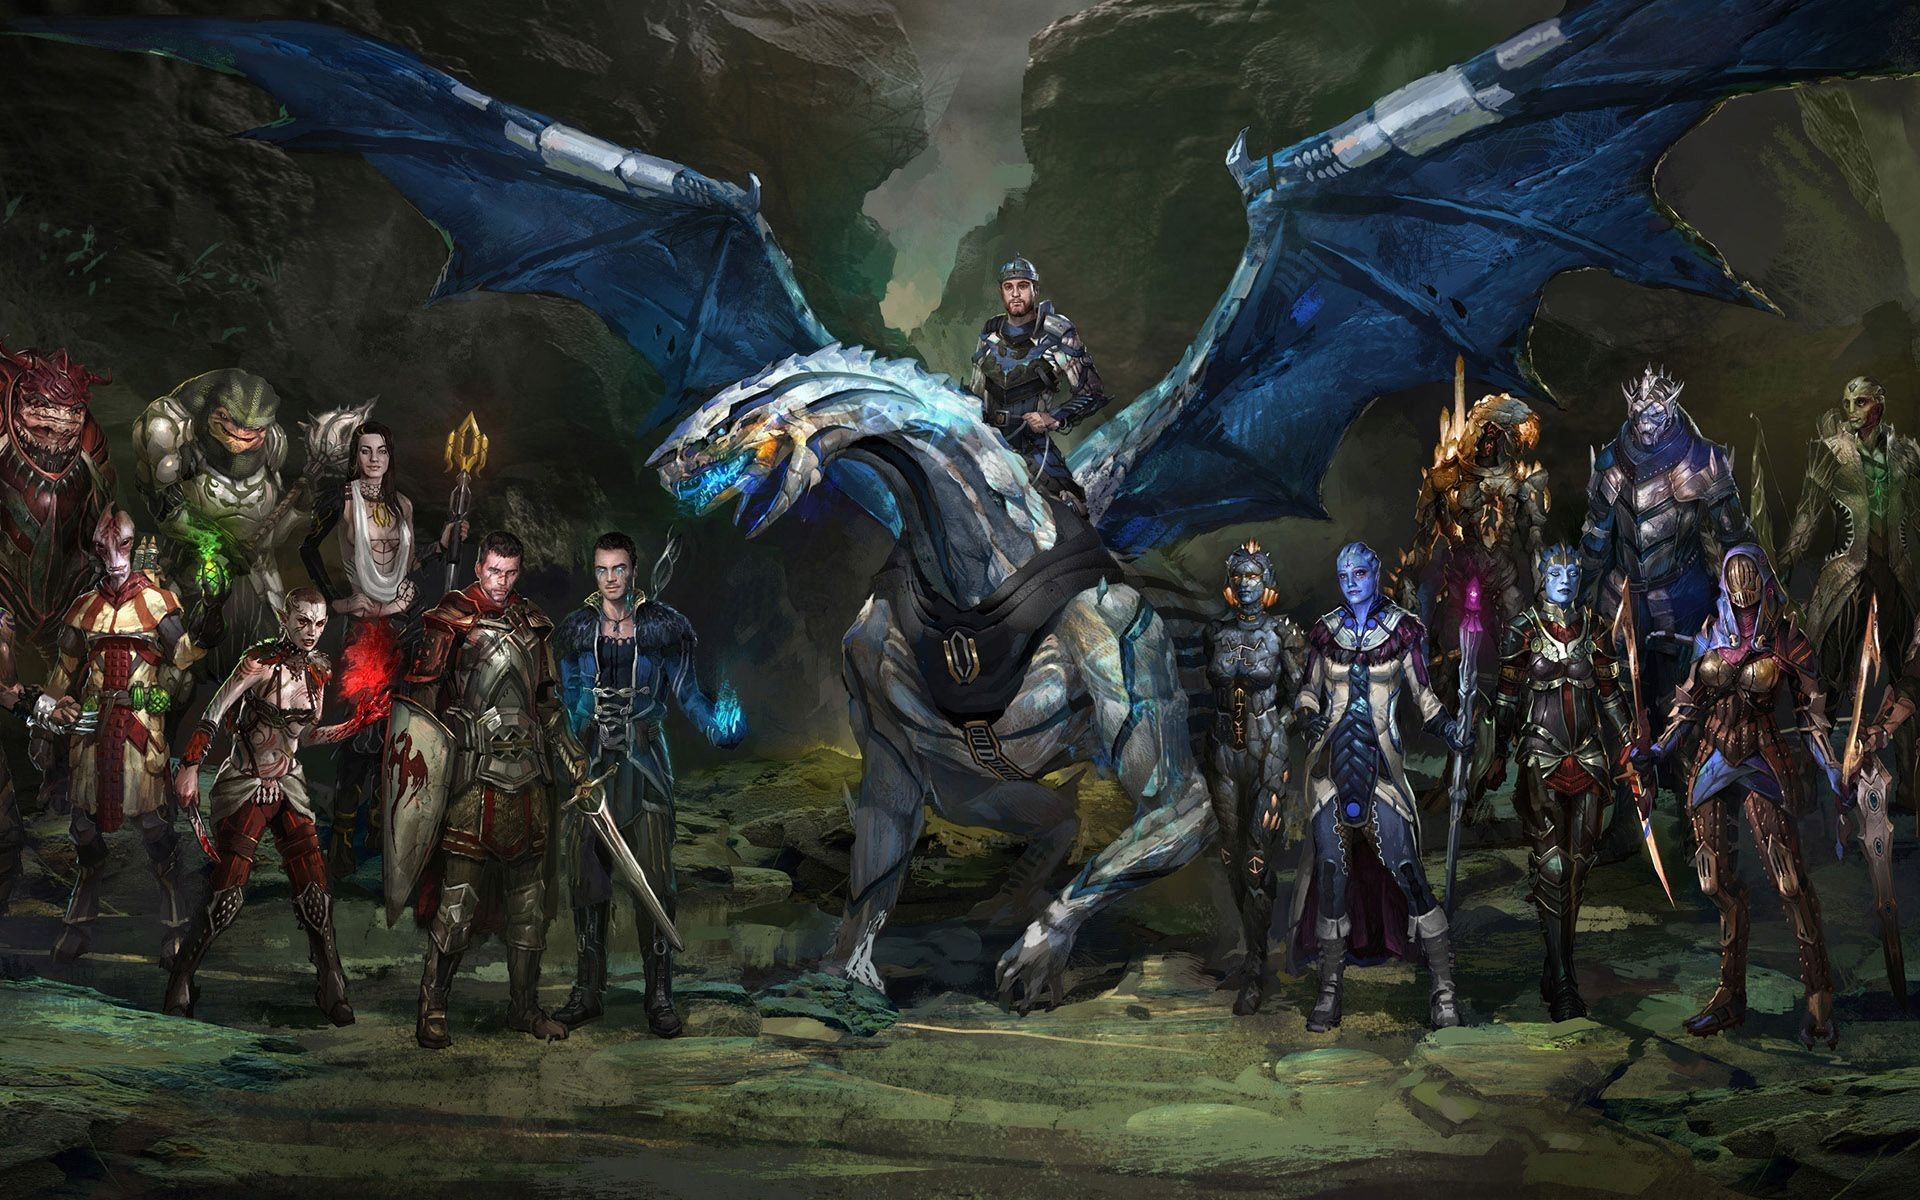 84 Dragon Age Inquisition